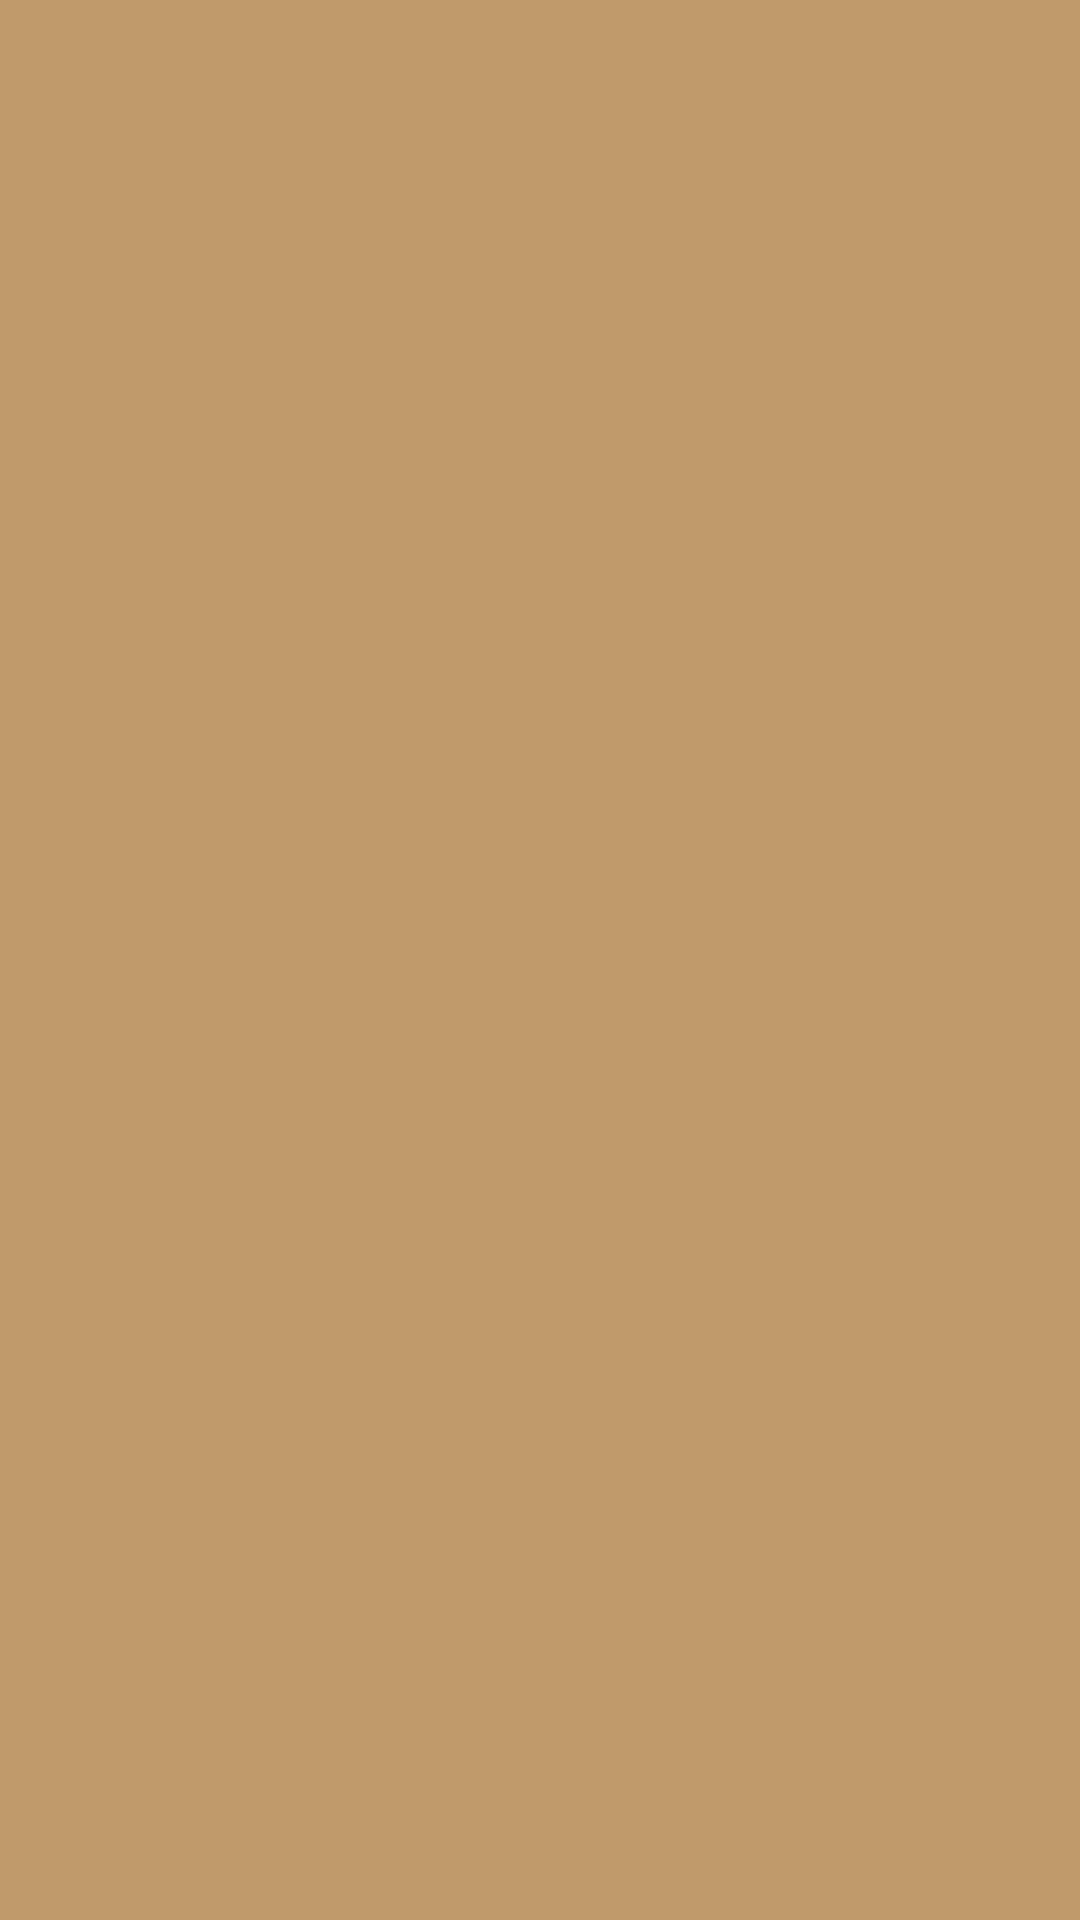 1080x1920 Desert Solid Color Background